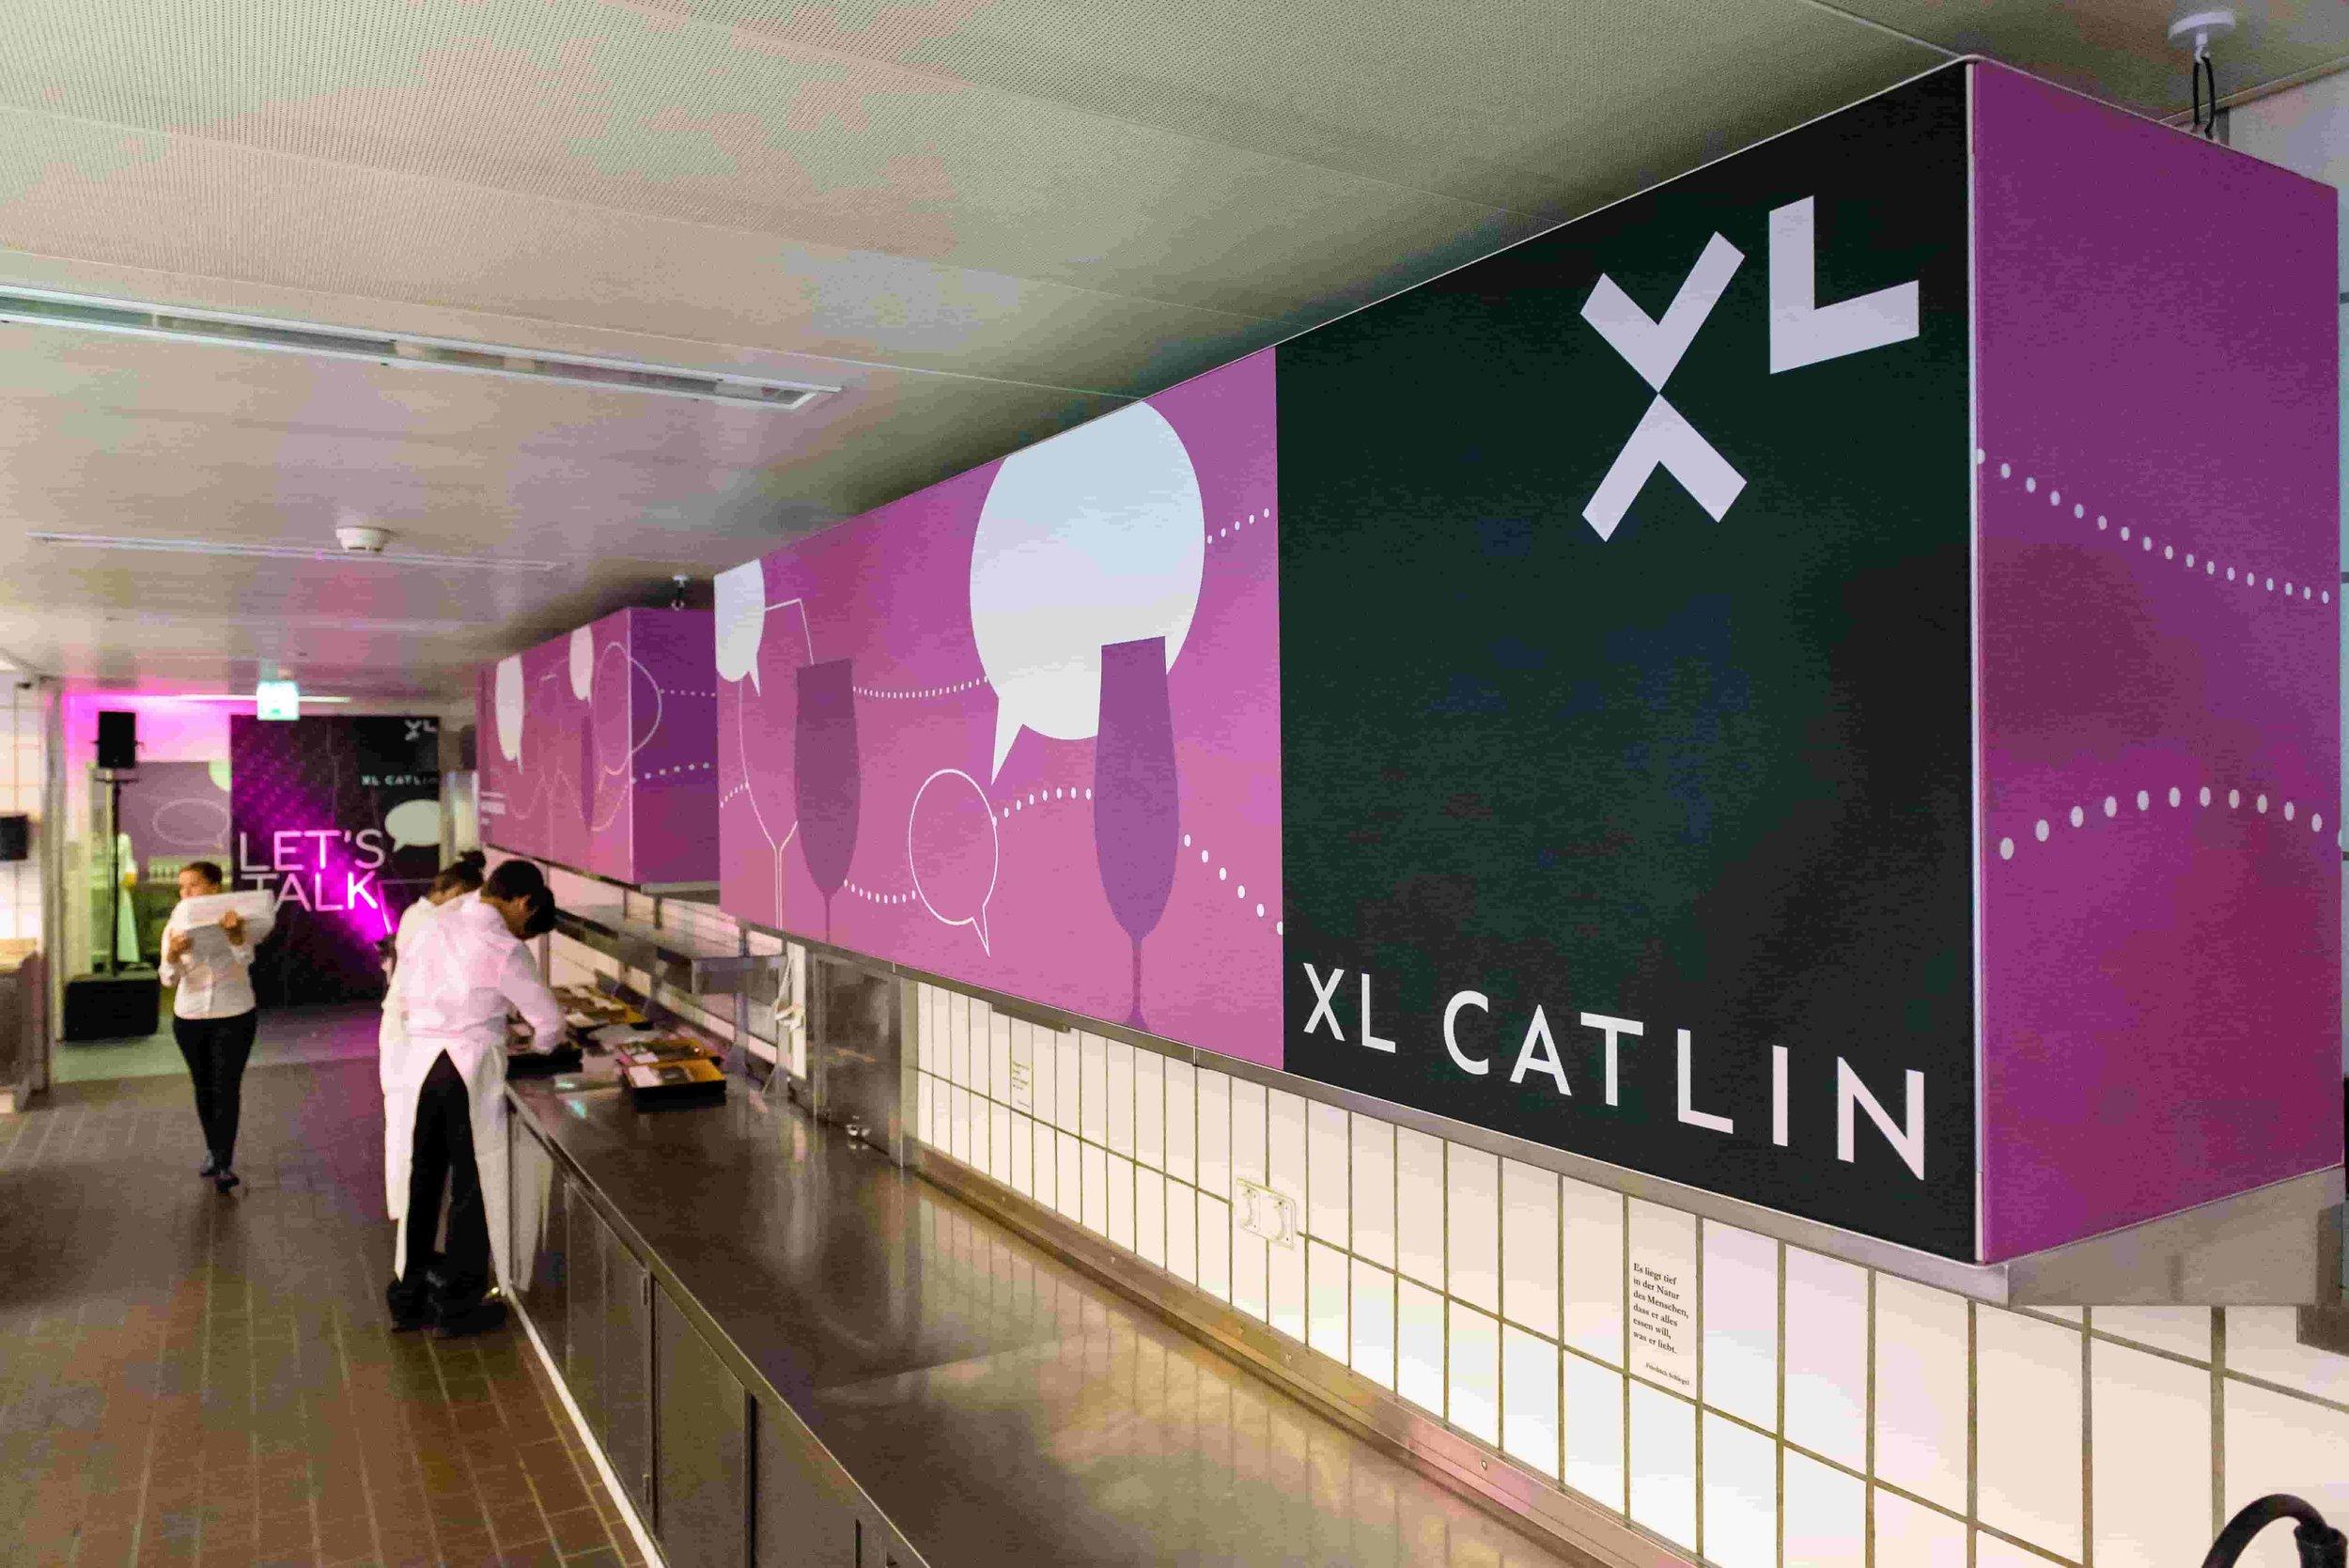 Bright-Entertainment-XL-Catlin_Kundenevent (7).jpg